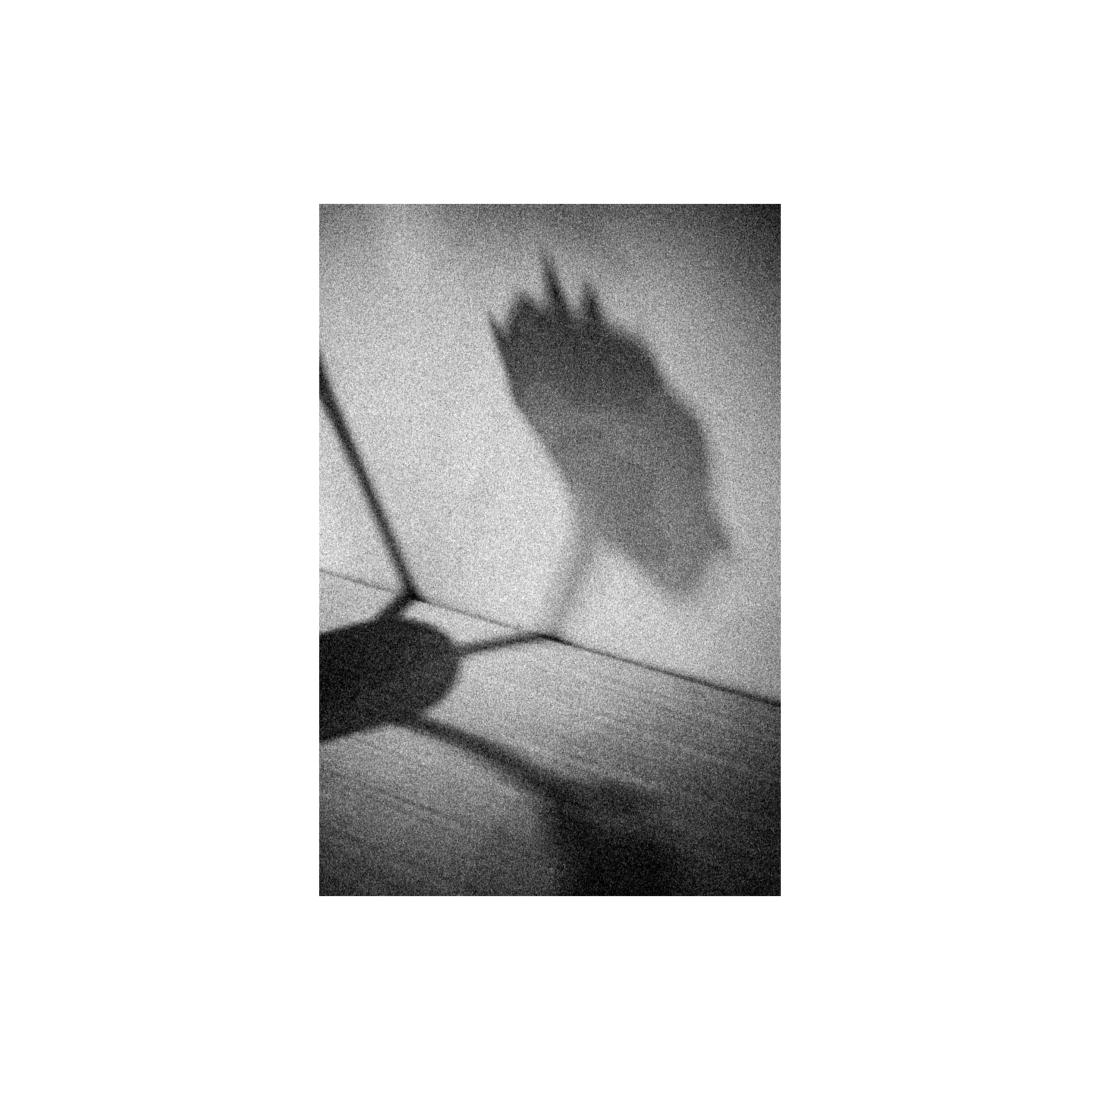 Shadows. London